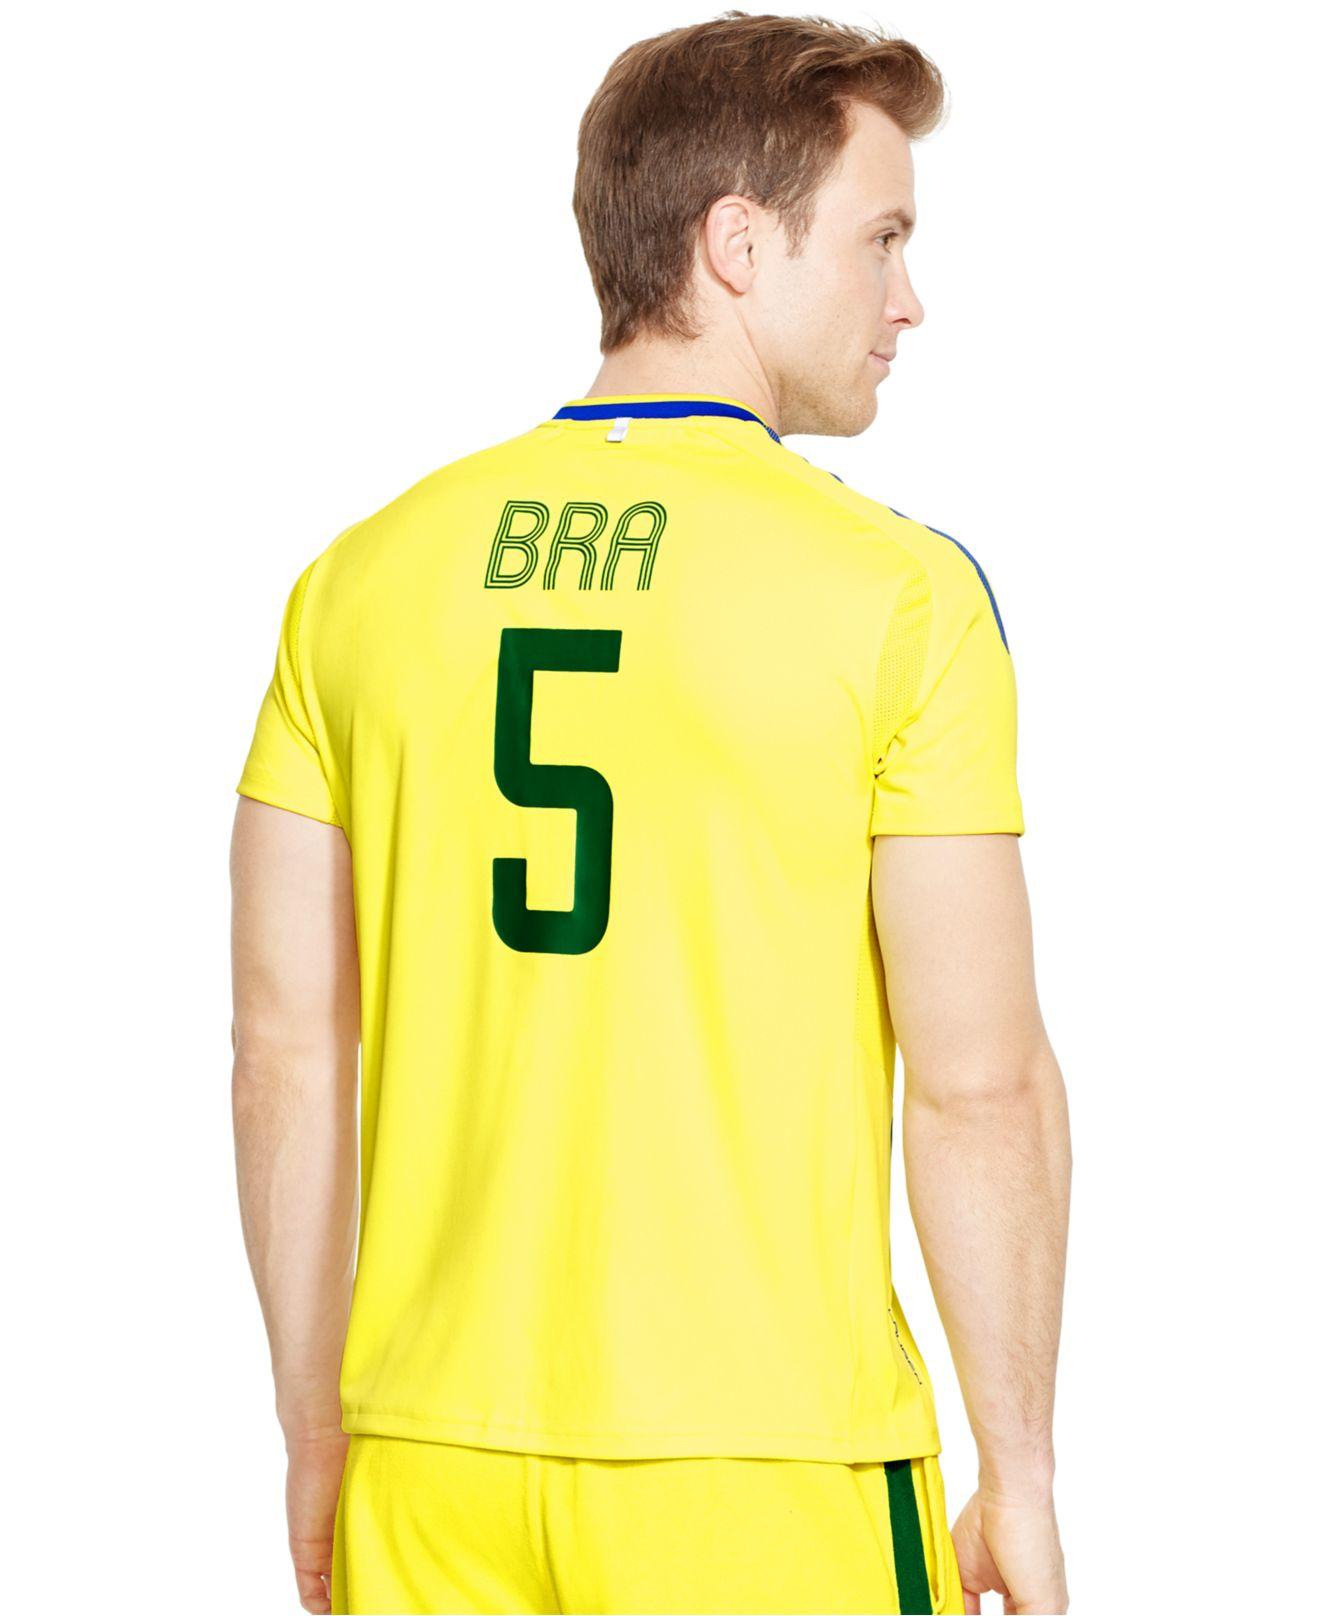 Polo ralph lauren polo sport brasil jersey t shirt in for Ralph lauren polo jersey shirt